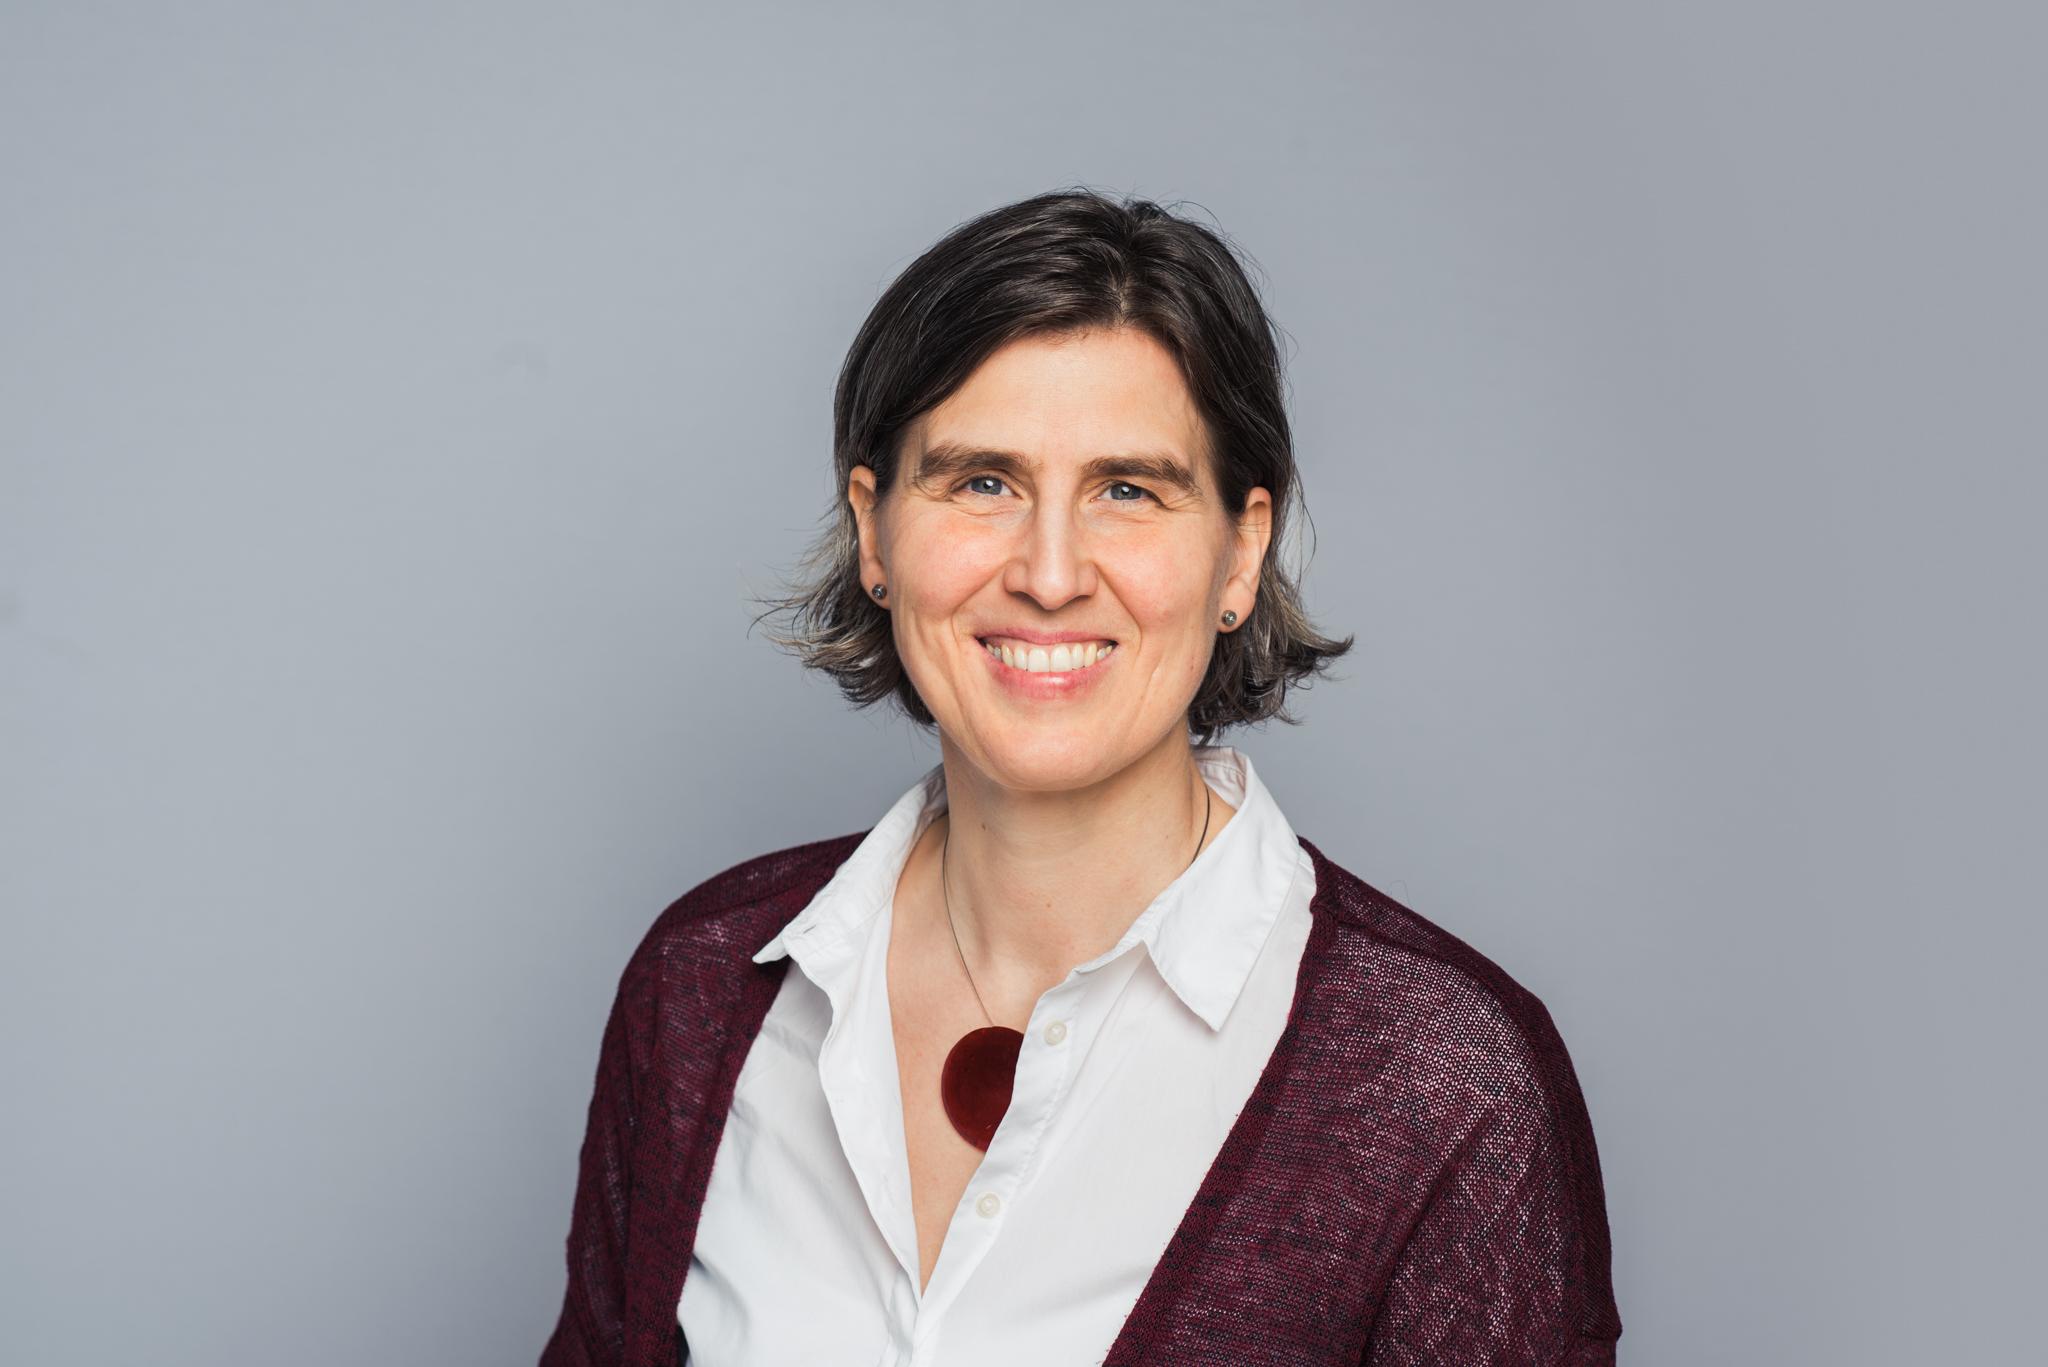 Portrettbilde, Jonina Hermannsdottir